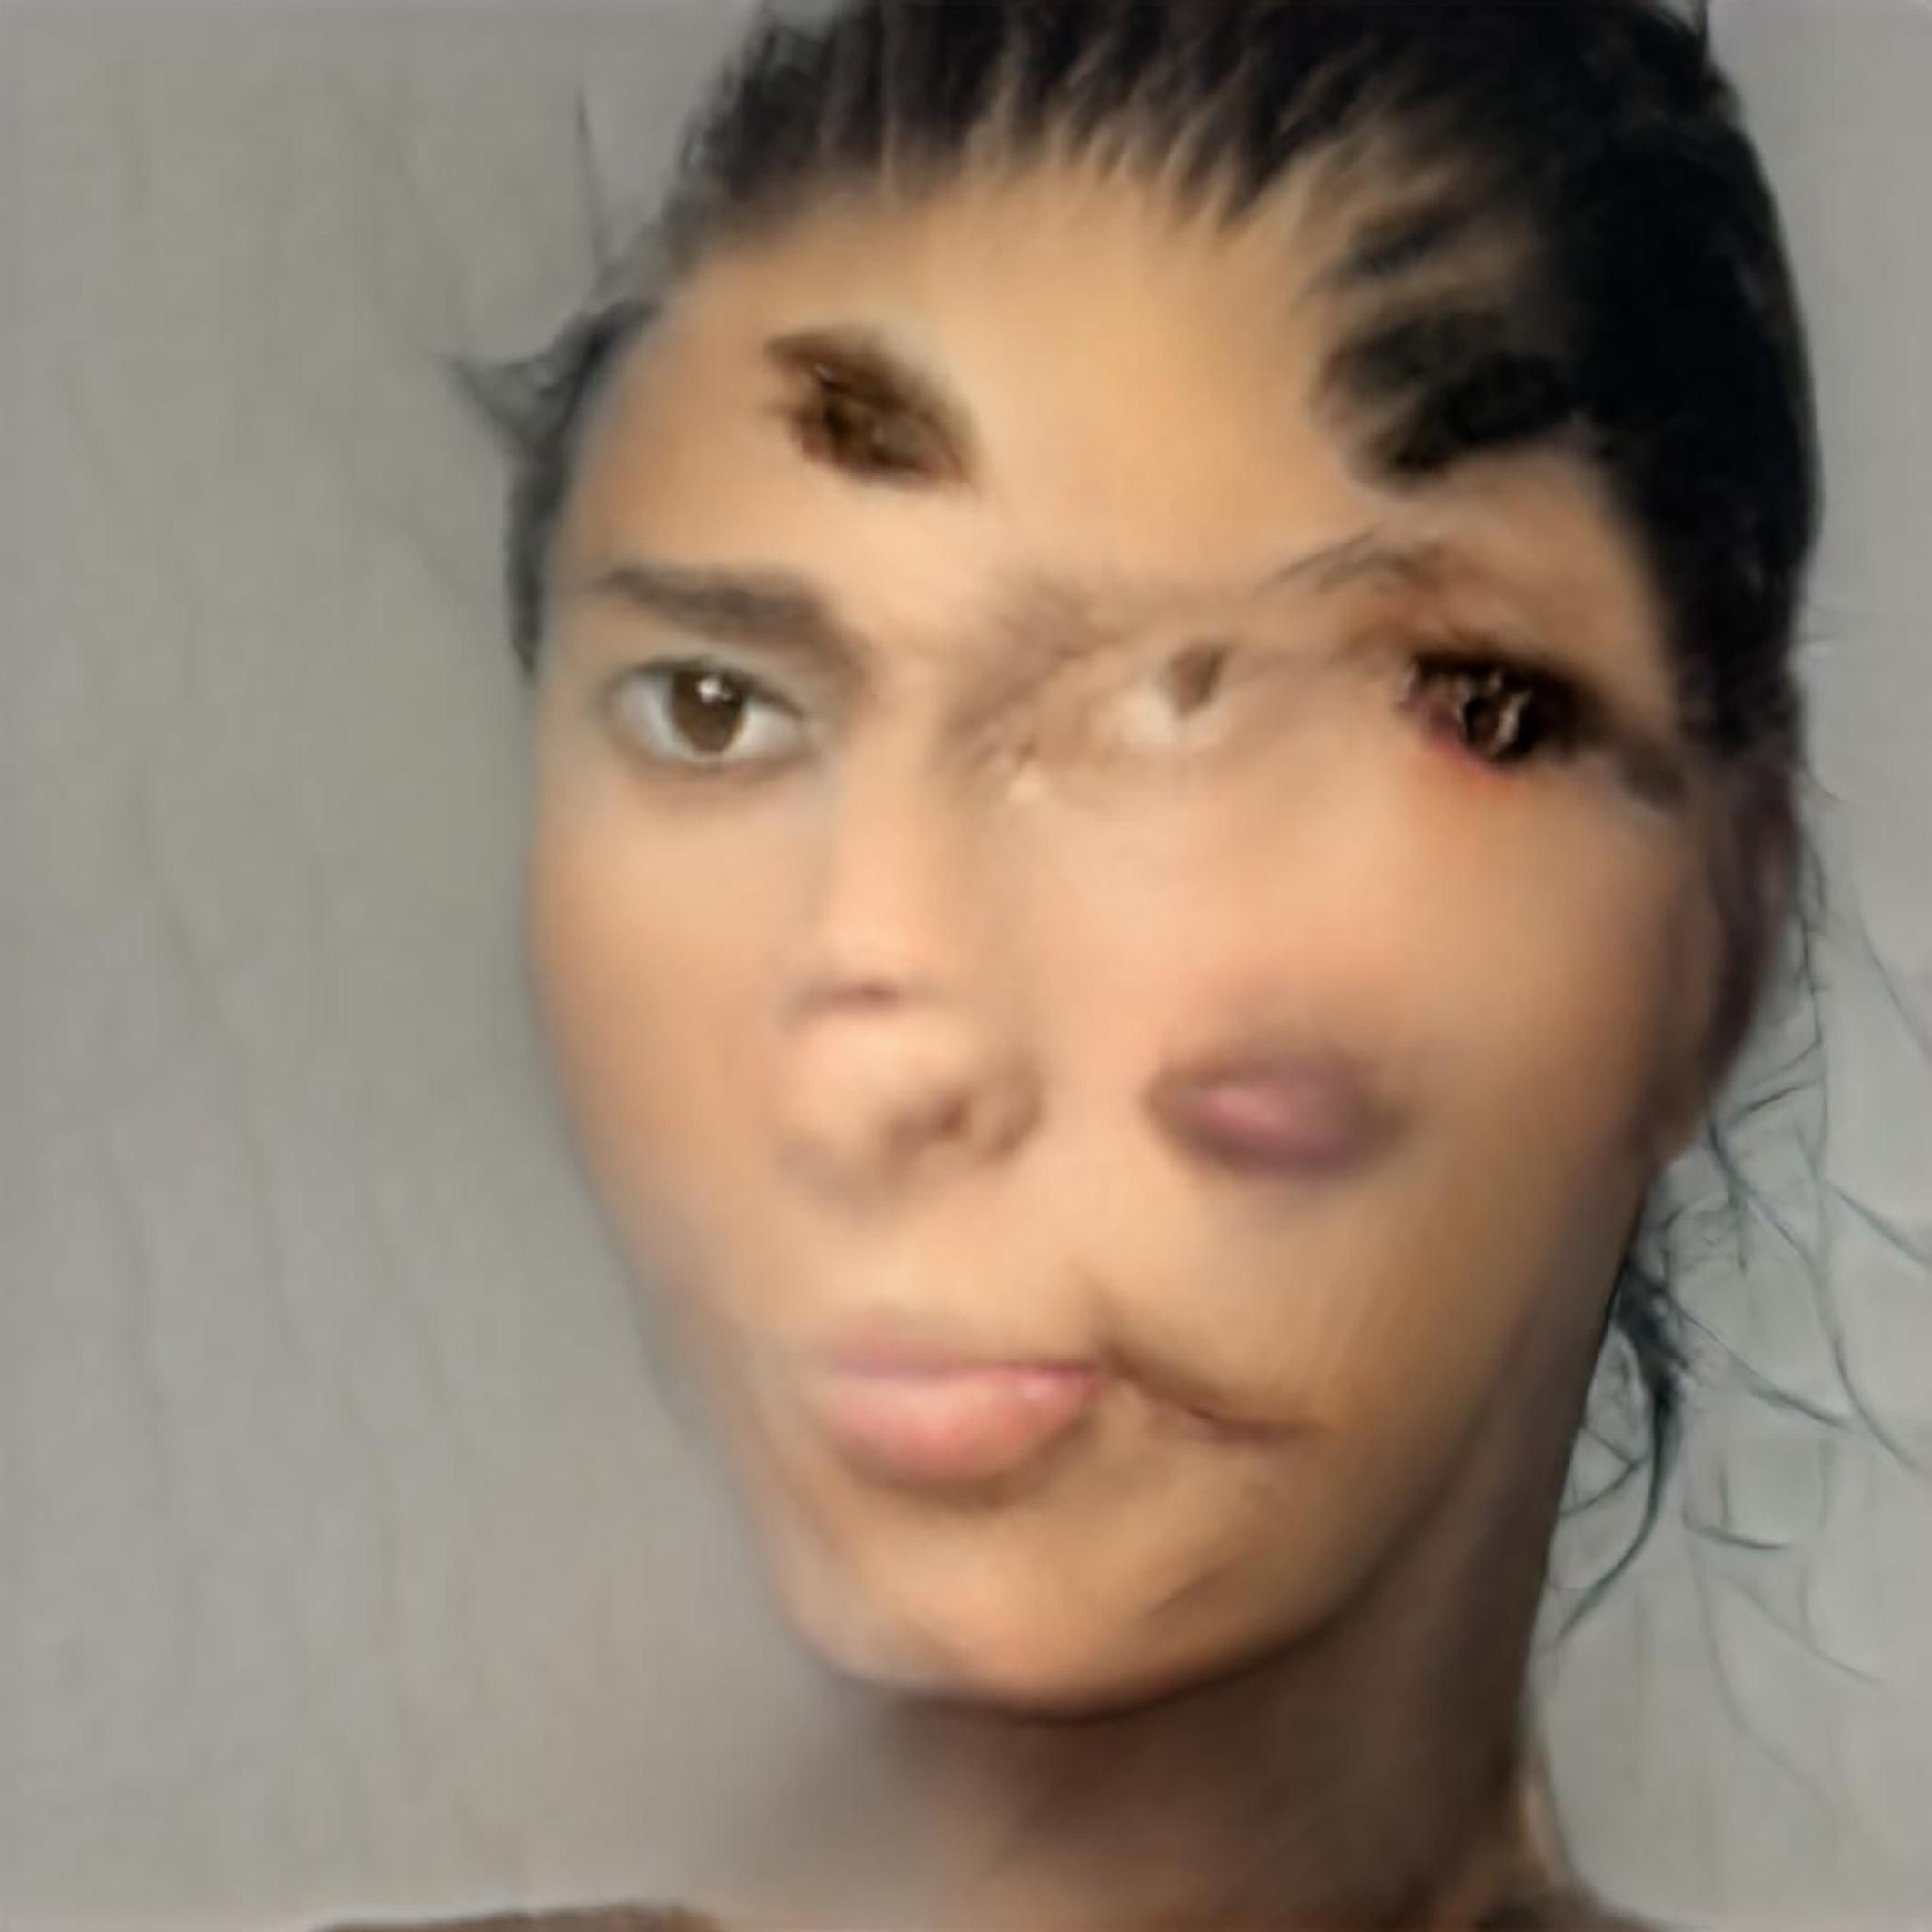 Cibelle Cavalli Bastos: SELF.i.e:0/ StyleGAN2, B.o.W.: A Picture Can't Take Me, Courtesy: Cibelle Cavalli Bastos